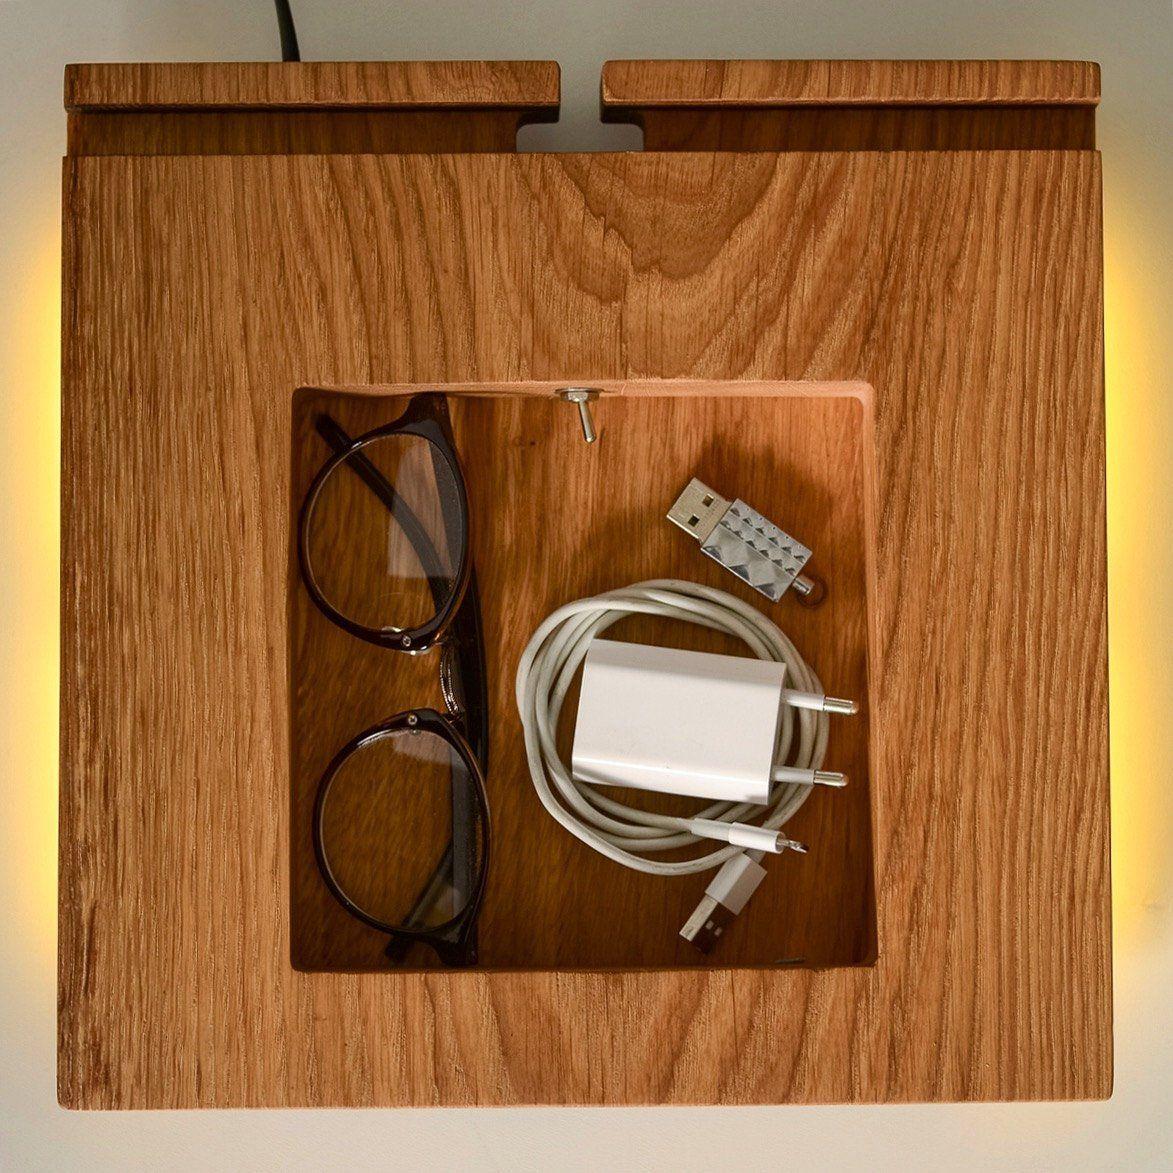 docking station table lamp DOCK#404 handmade. minimal. oak